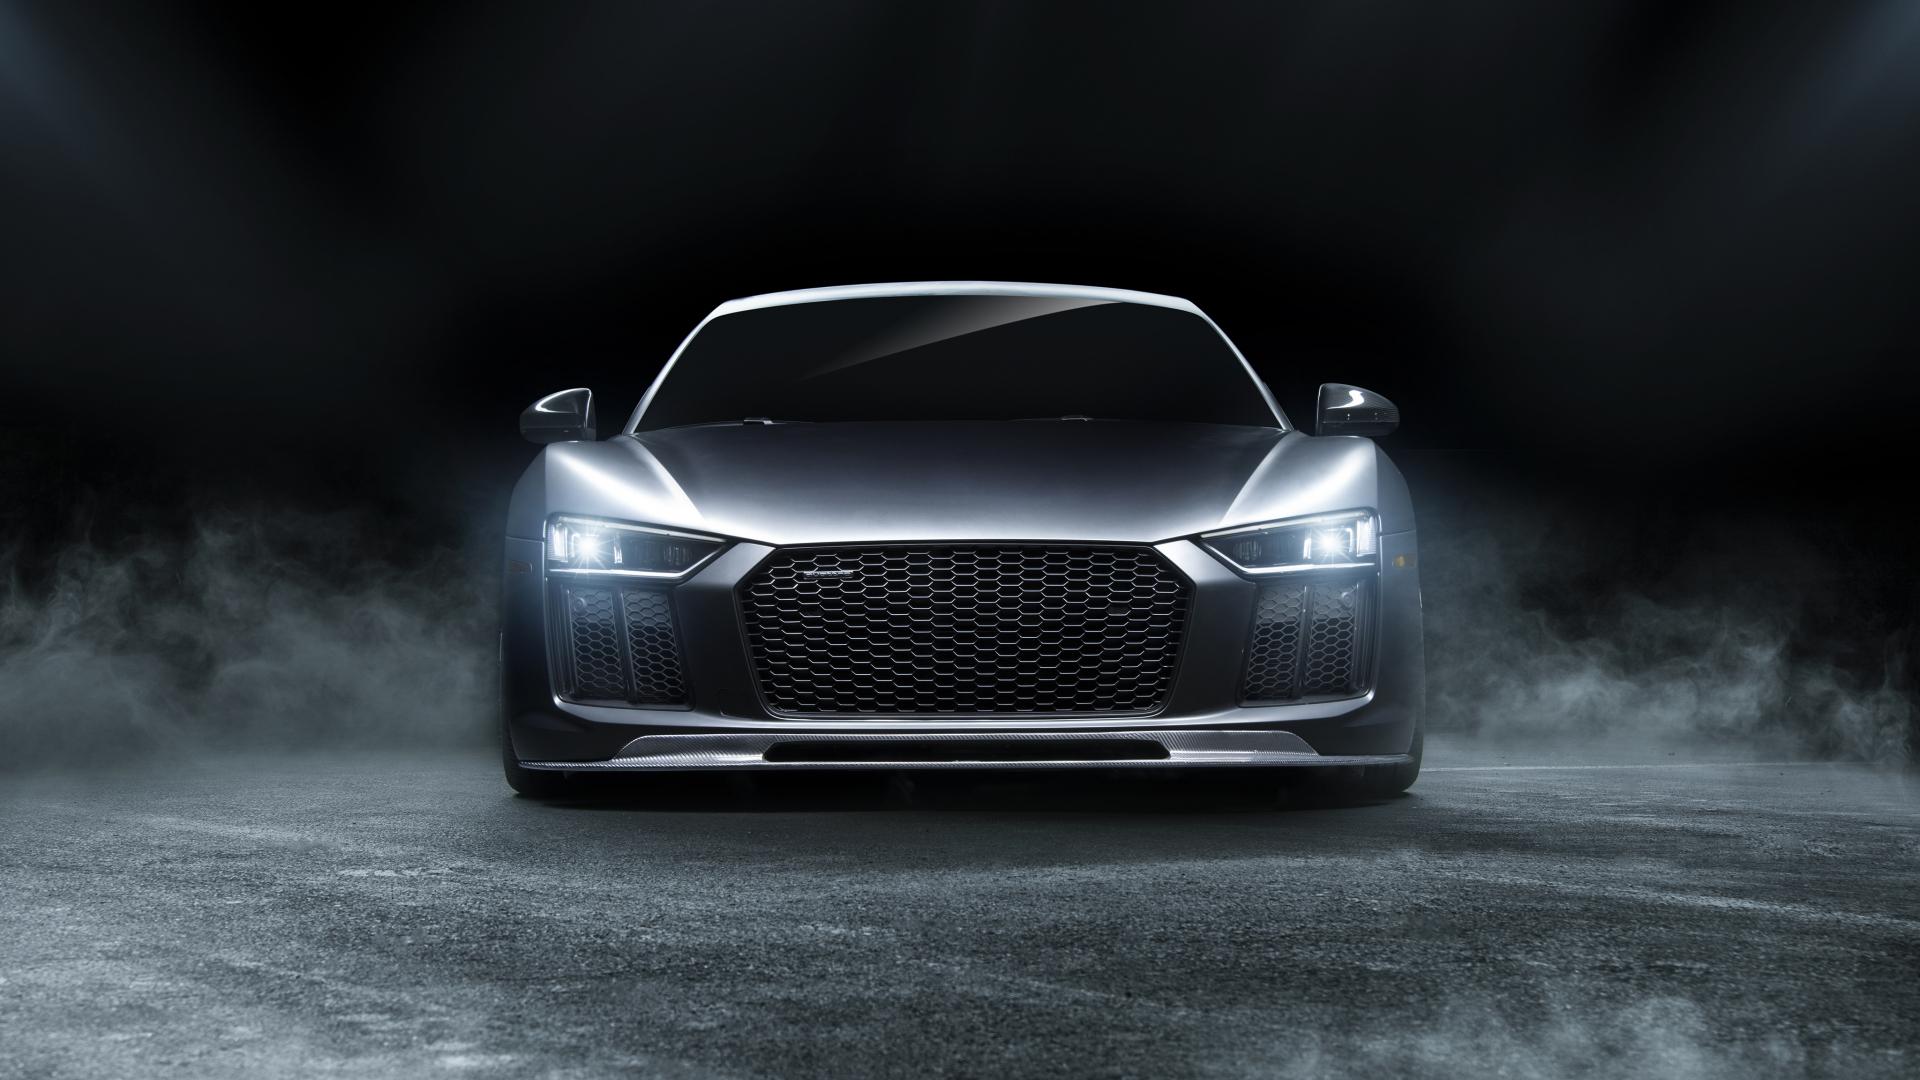 Download 1920x1080 Wallpaper Audi R8, Sports Car, Front ...